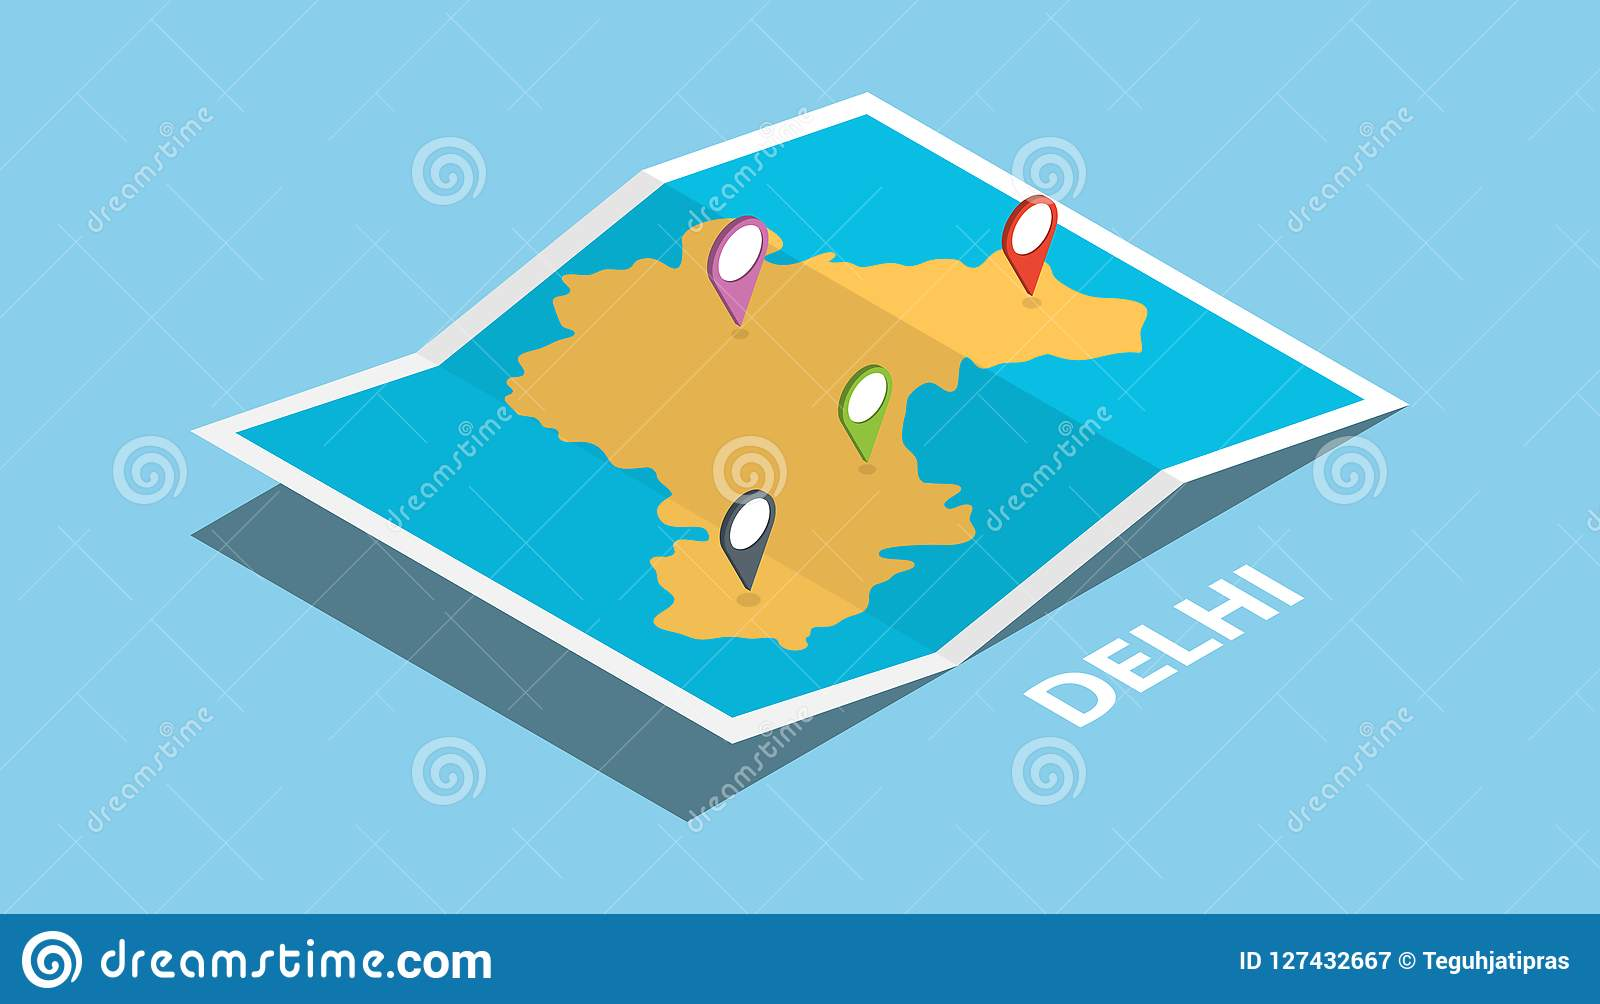 Delhi India Explore Maps Location With Folded Map And Pin ... on moscow map, delhi airport map, islamabad map, shanghai map, lisbon map, hindu kush map, barcelona spain map, kolkata map, kashmir map, delhi india poster, manila map, beijing china map, istanbul turkey map, kathmandu nepal map, mexico city map, karachi map, lahore pakistan map, calcutta map, dhaka bangladesh map, guangzhou china map,